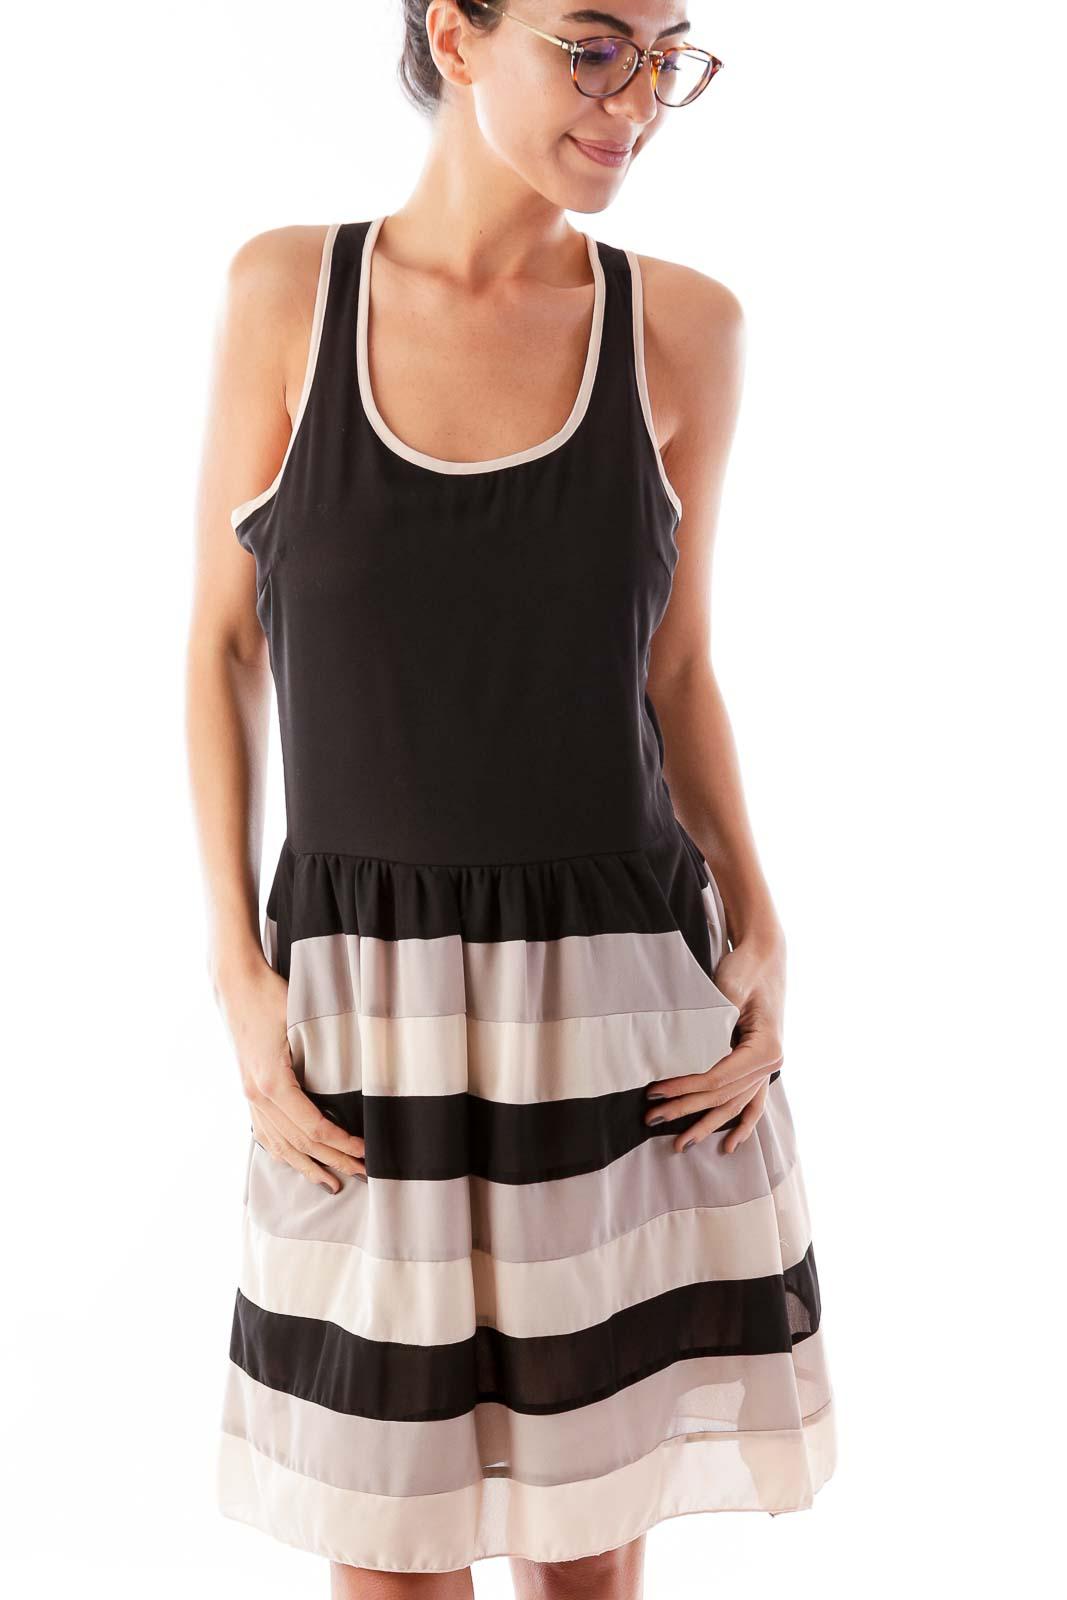 Black Striped Racerback Dress Front